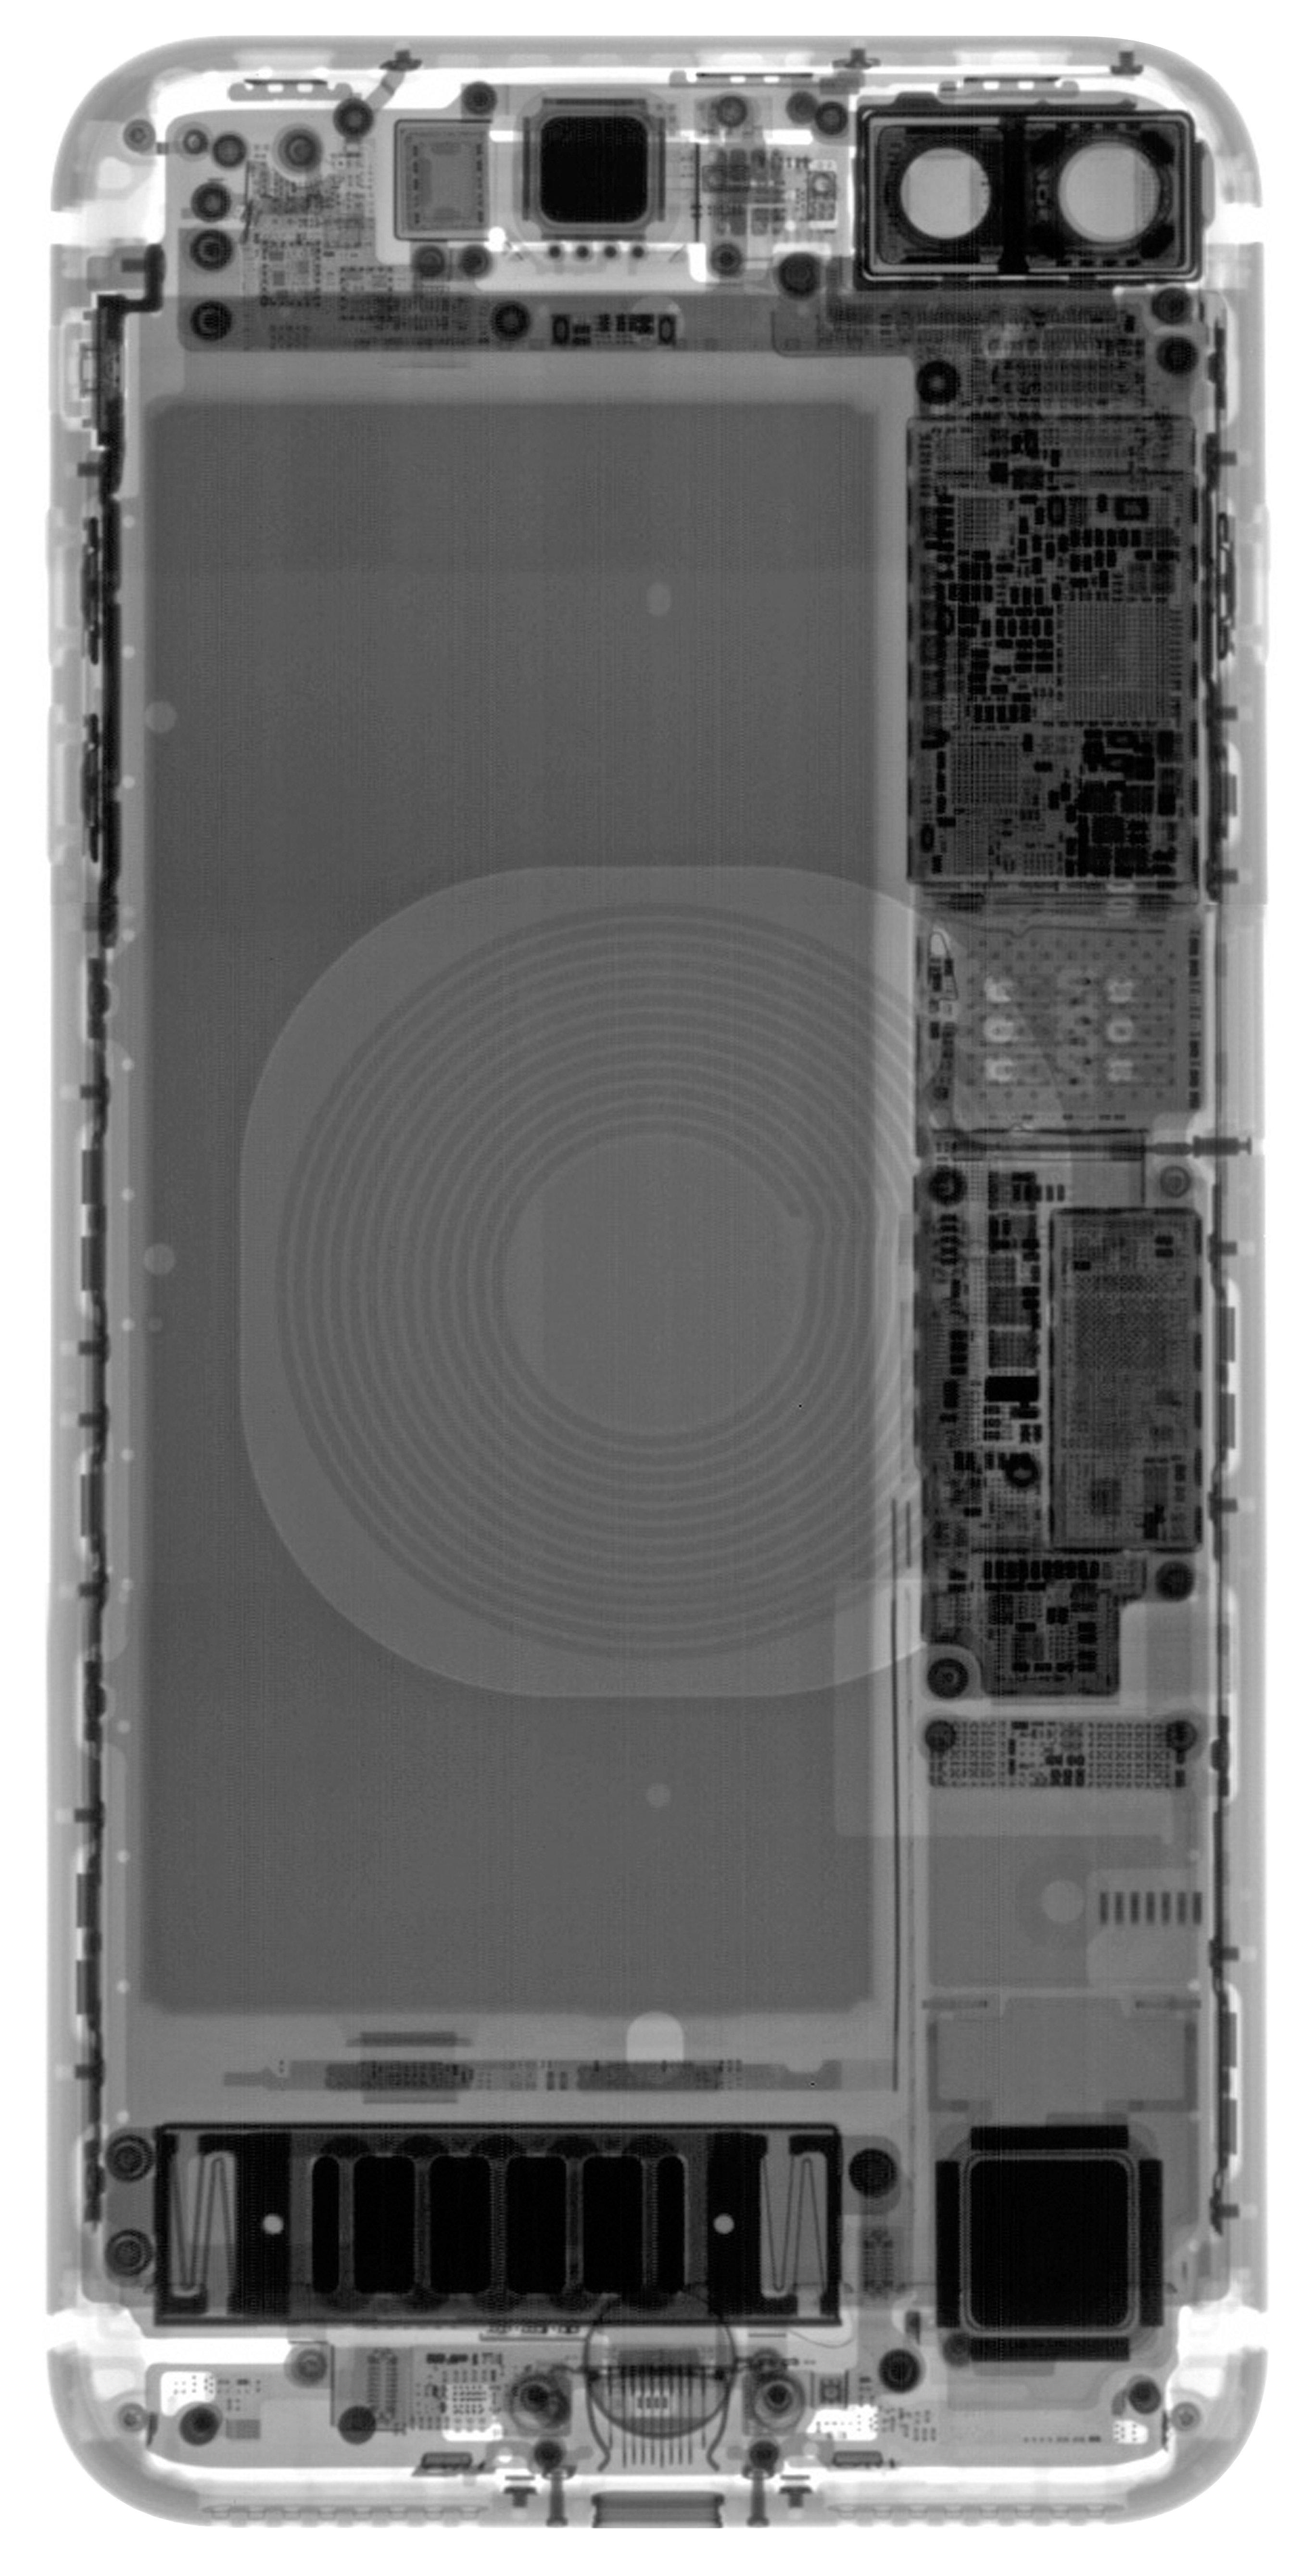 Weve Got Your Iphone 8 Teardown Wallpapers Ifixit